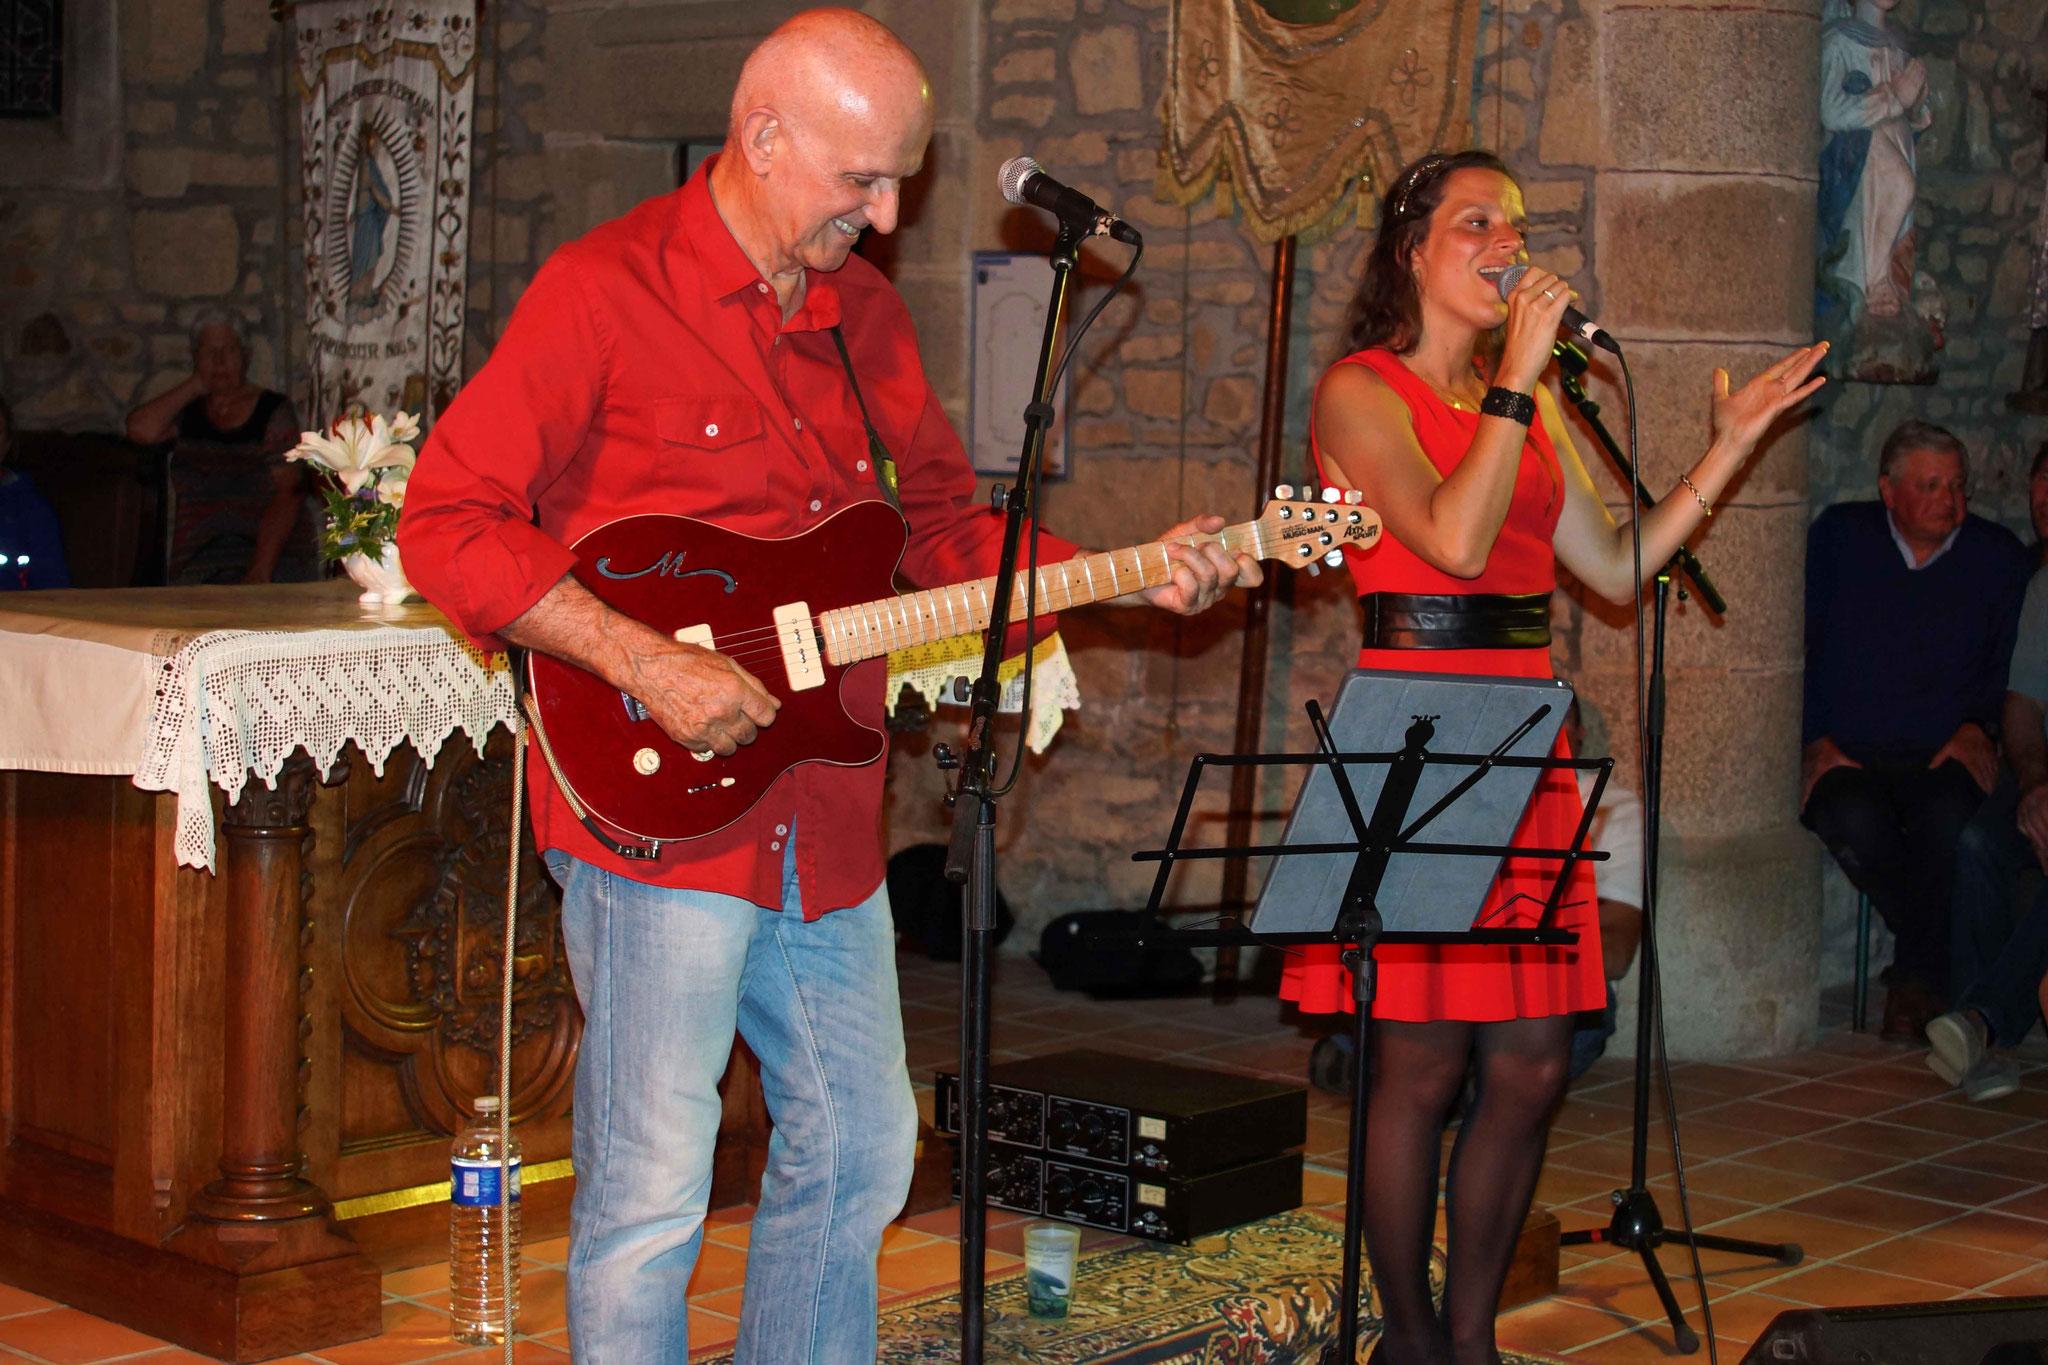 Concert de Kermaria Sulard, 28 août 2016 ; 4